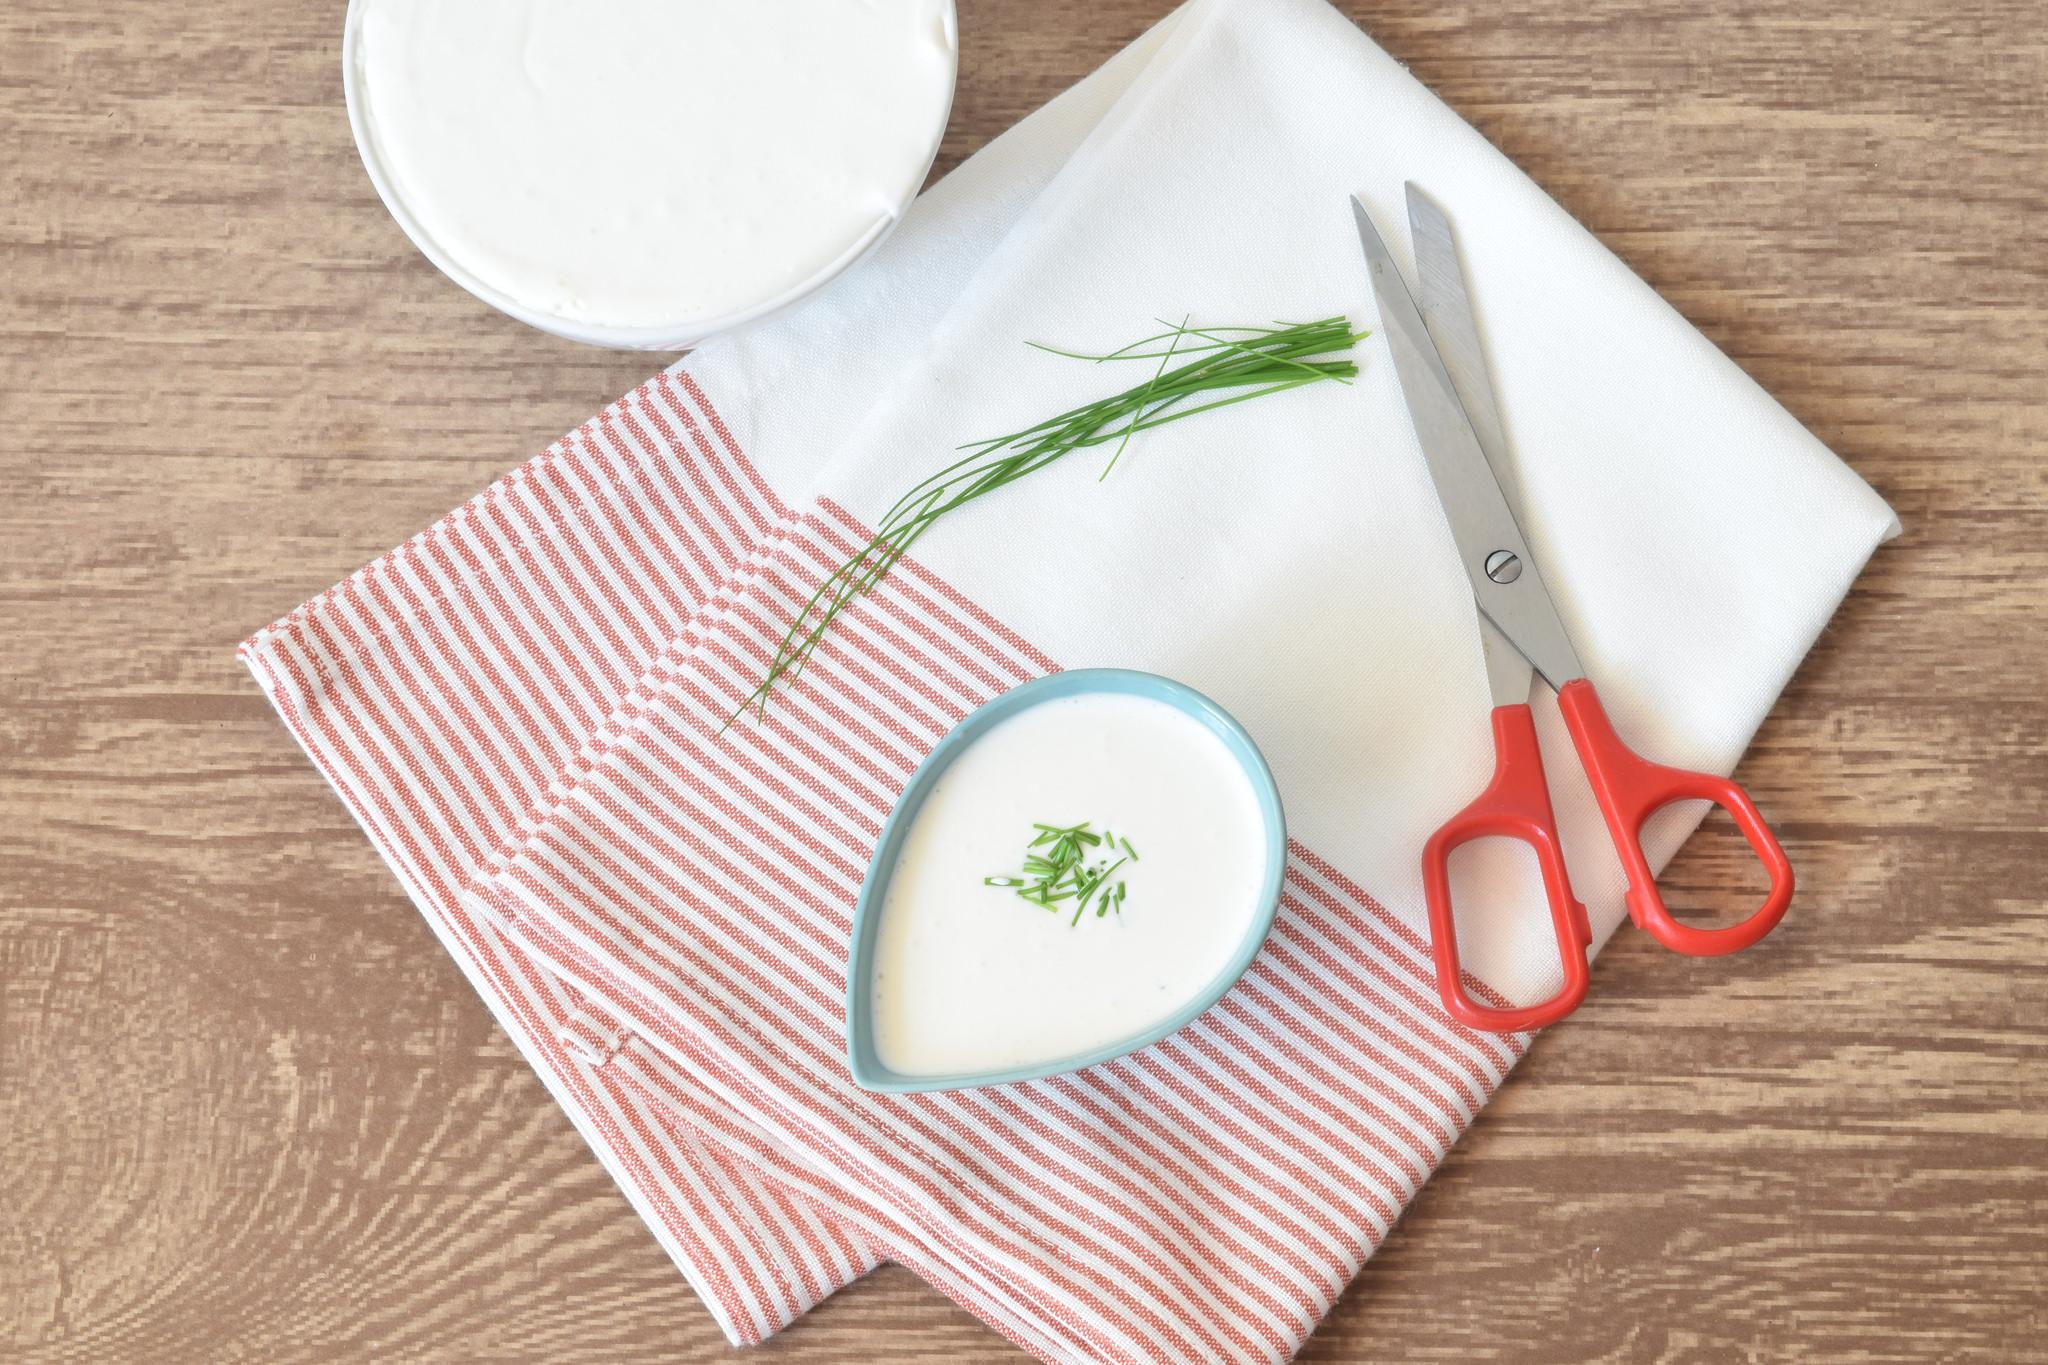 Panna da cucina con latte di soia bimby tm31 tm5 - Bimby da cucina ...